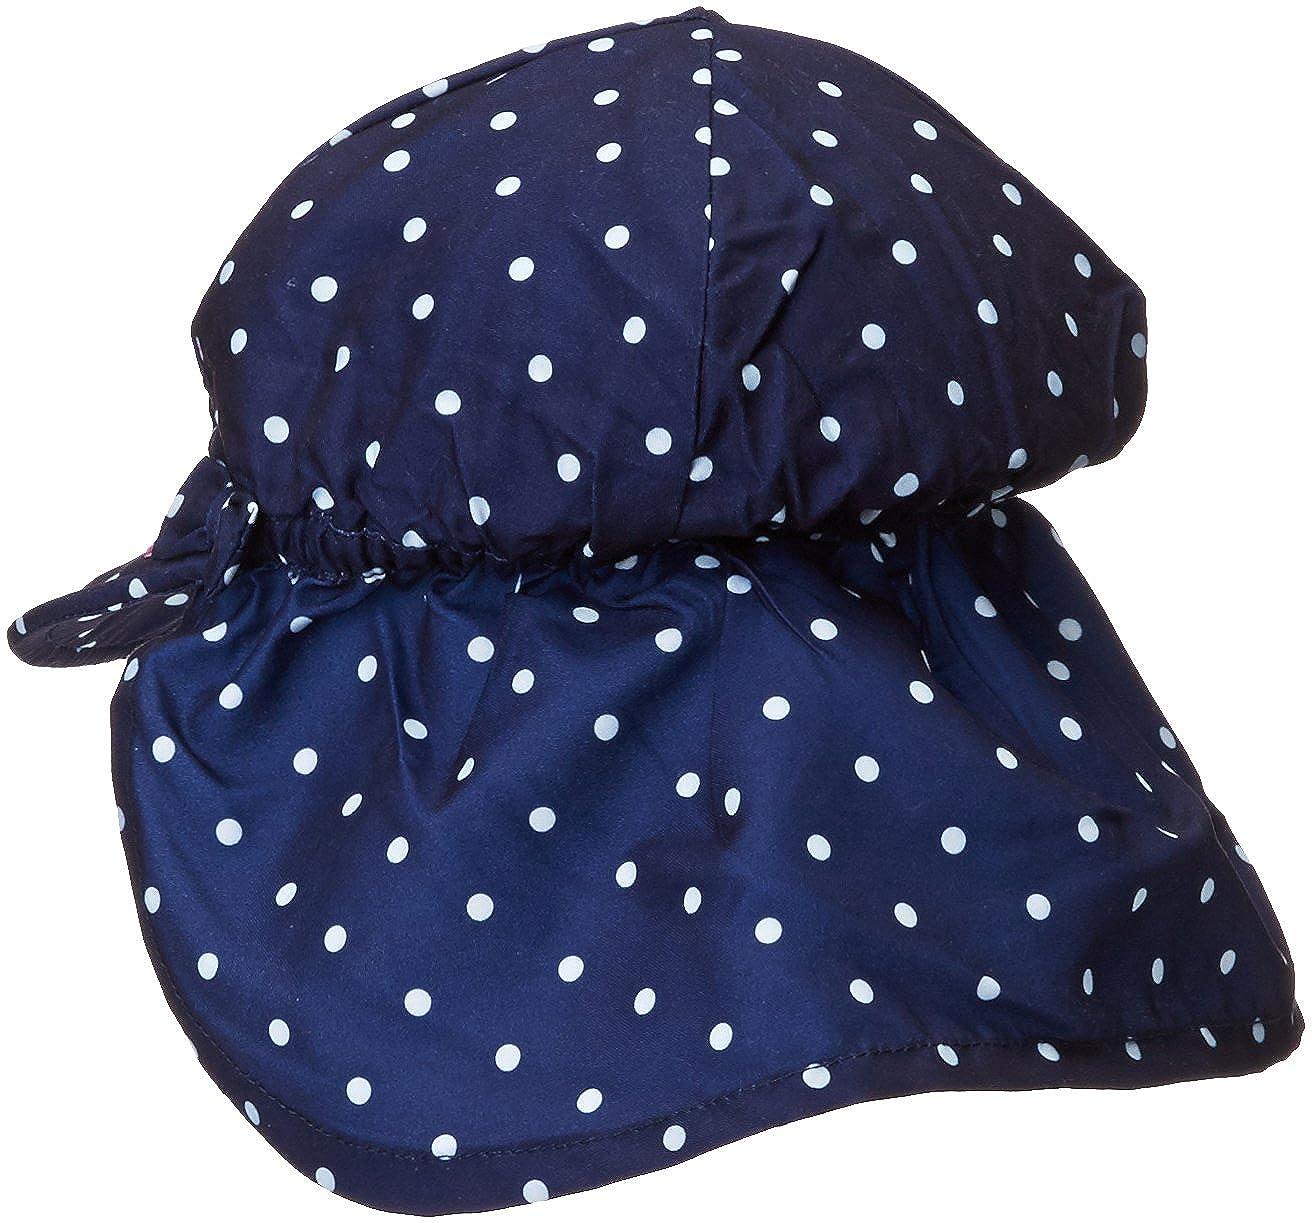 e78e505aa6944 Amazon.com: Jojo Maman Bebe Baby Girls' Girls' Flap Hat, Navy White Dot, 0  6 Months: Clothing